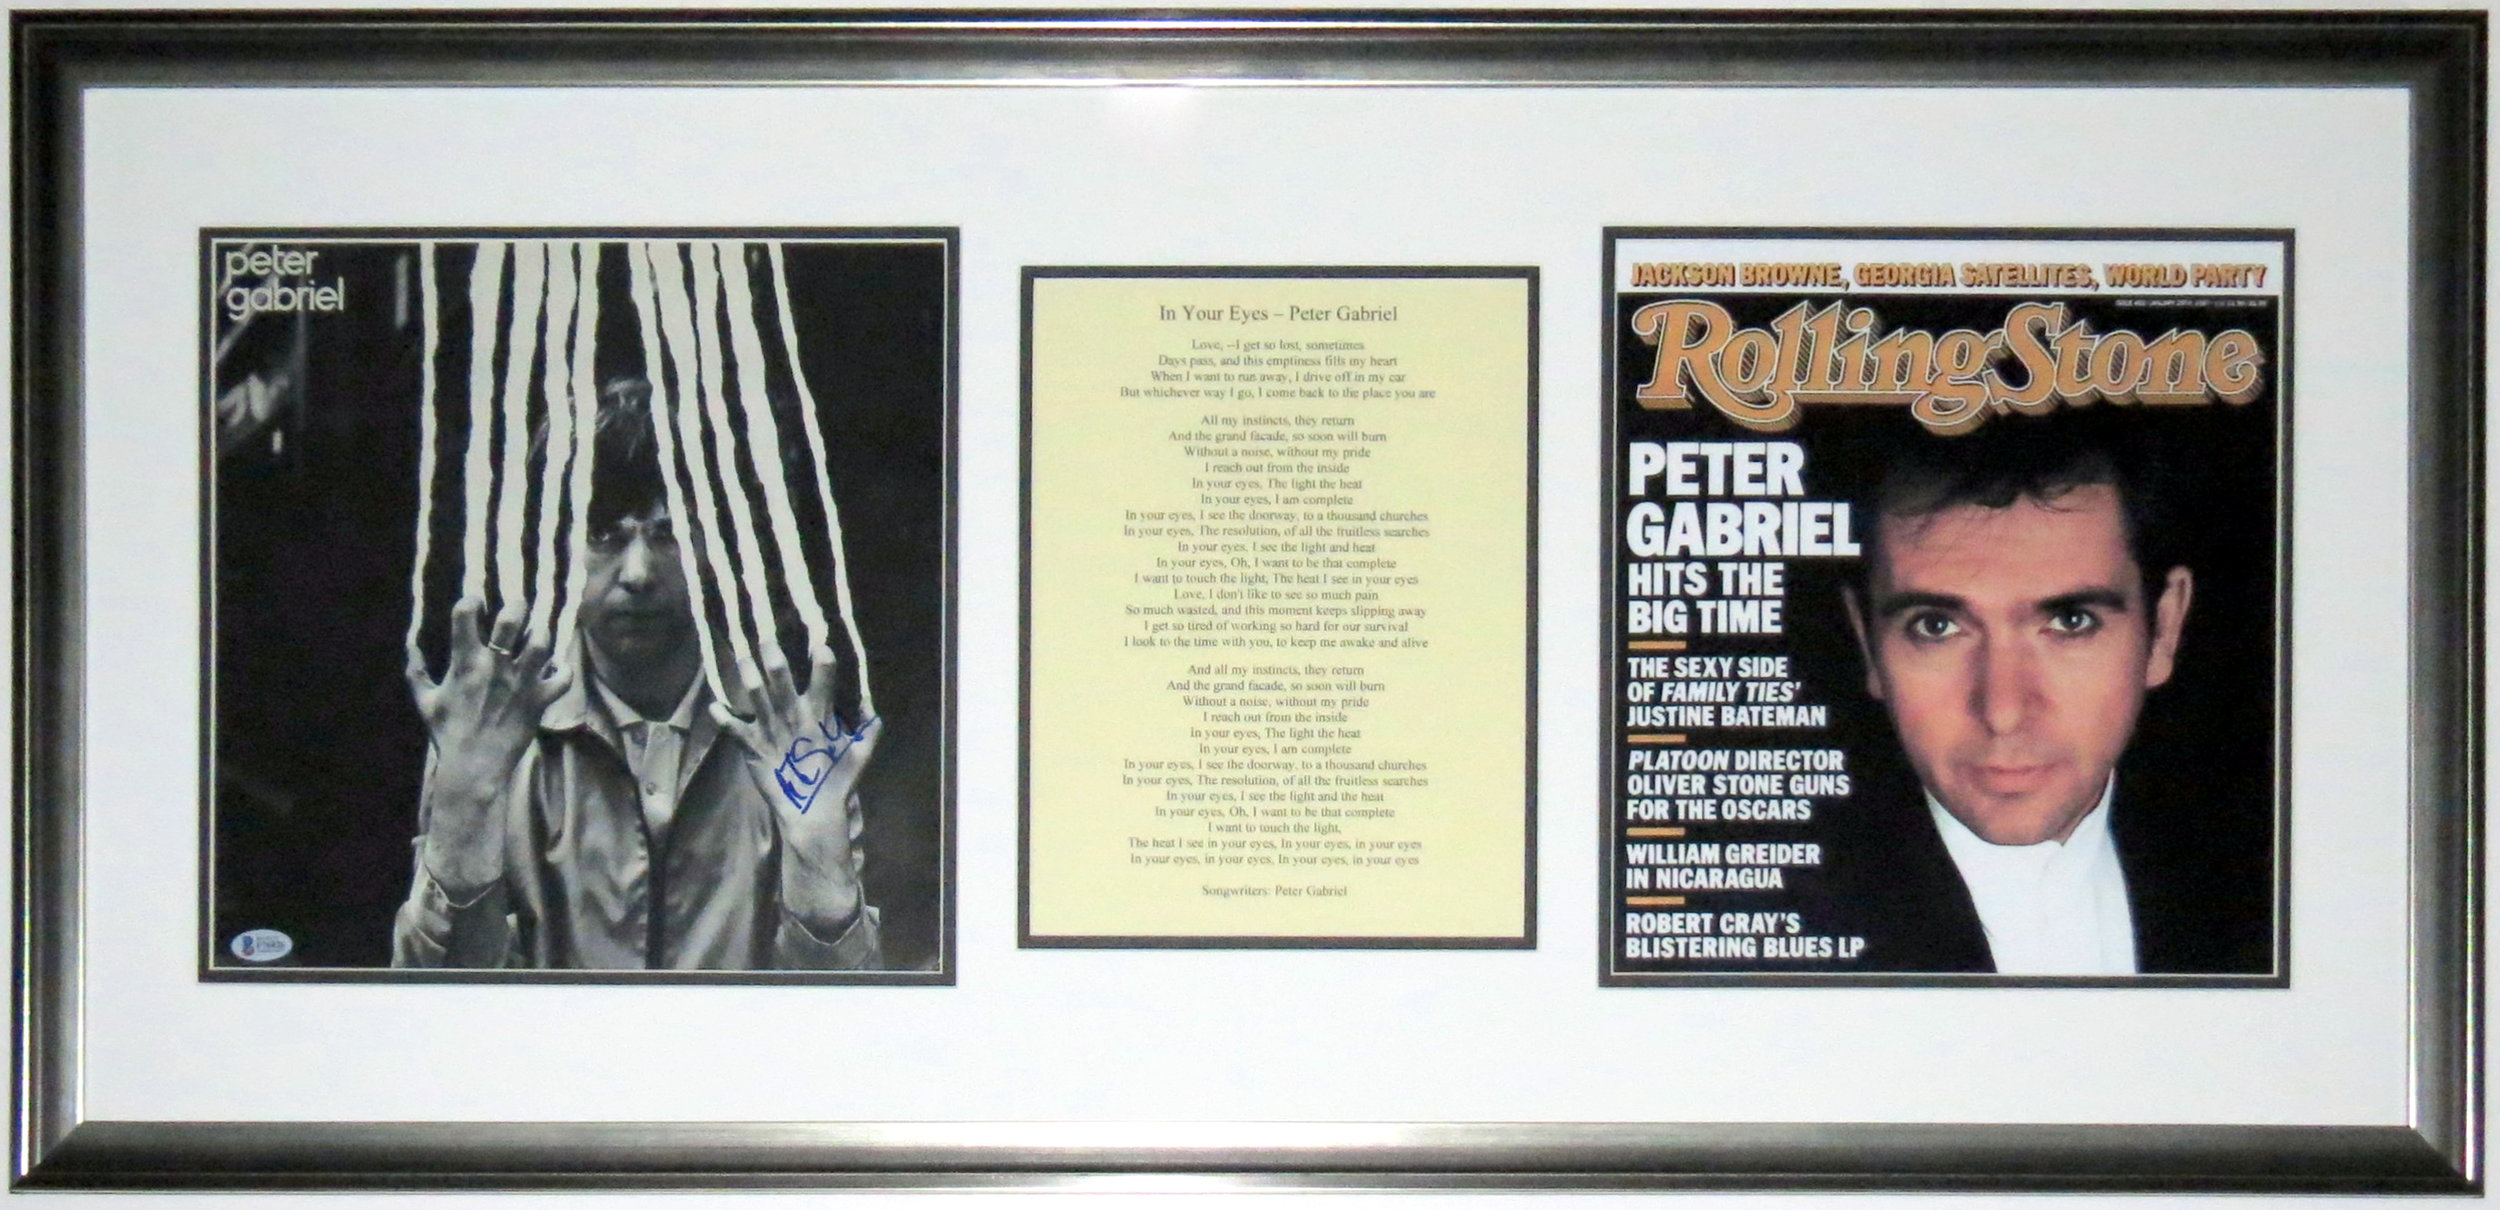 Peter Gabriel Signed 2 Album - BAS COA Authenticated - Professionally Framed & Rolling Stone Magazine Photo & In Your Eyes Lyrics 38x18